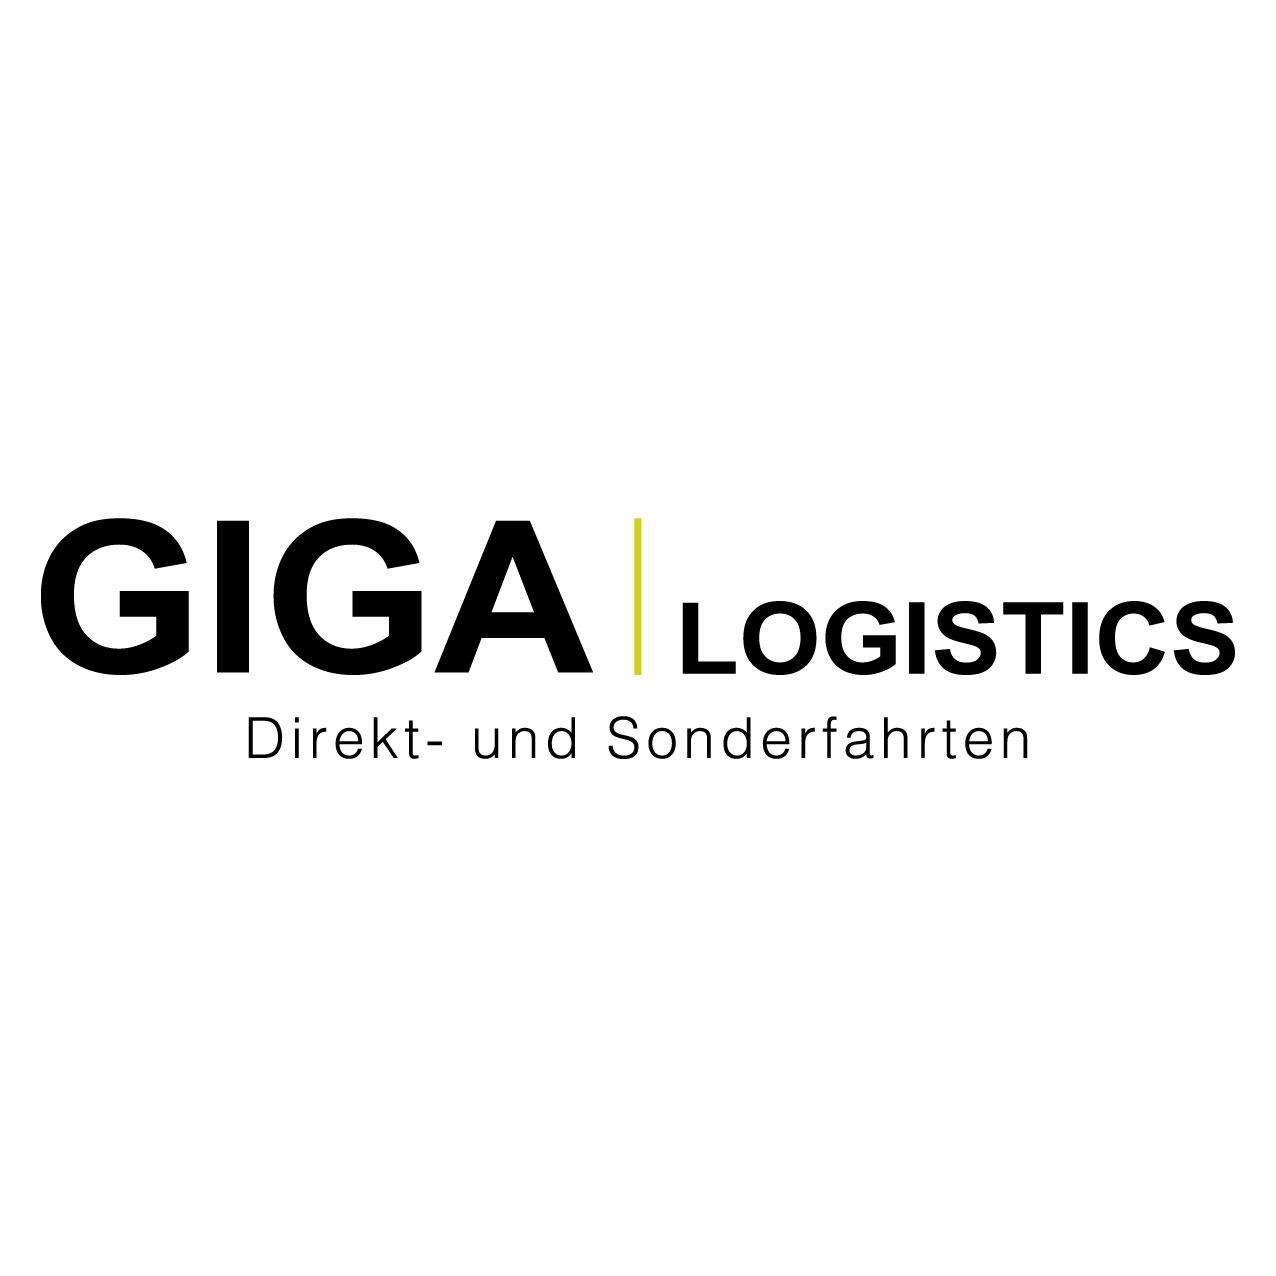 GIGA Logistics GmbH